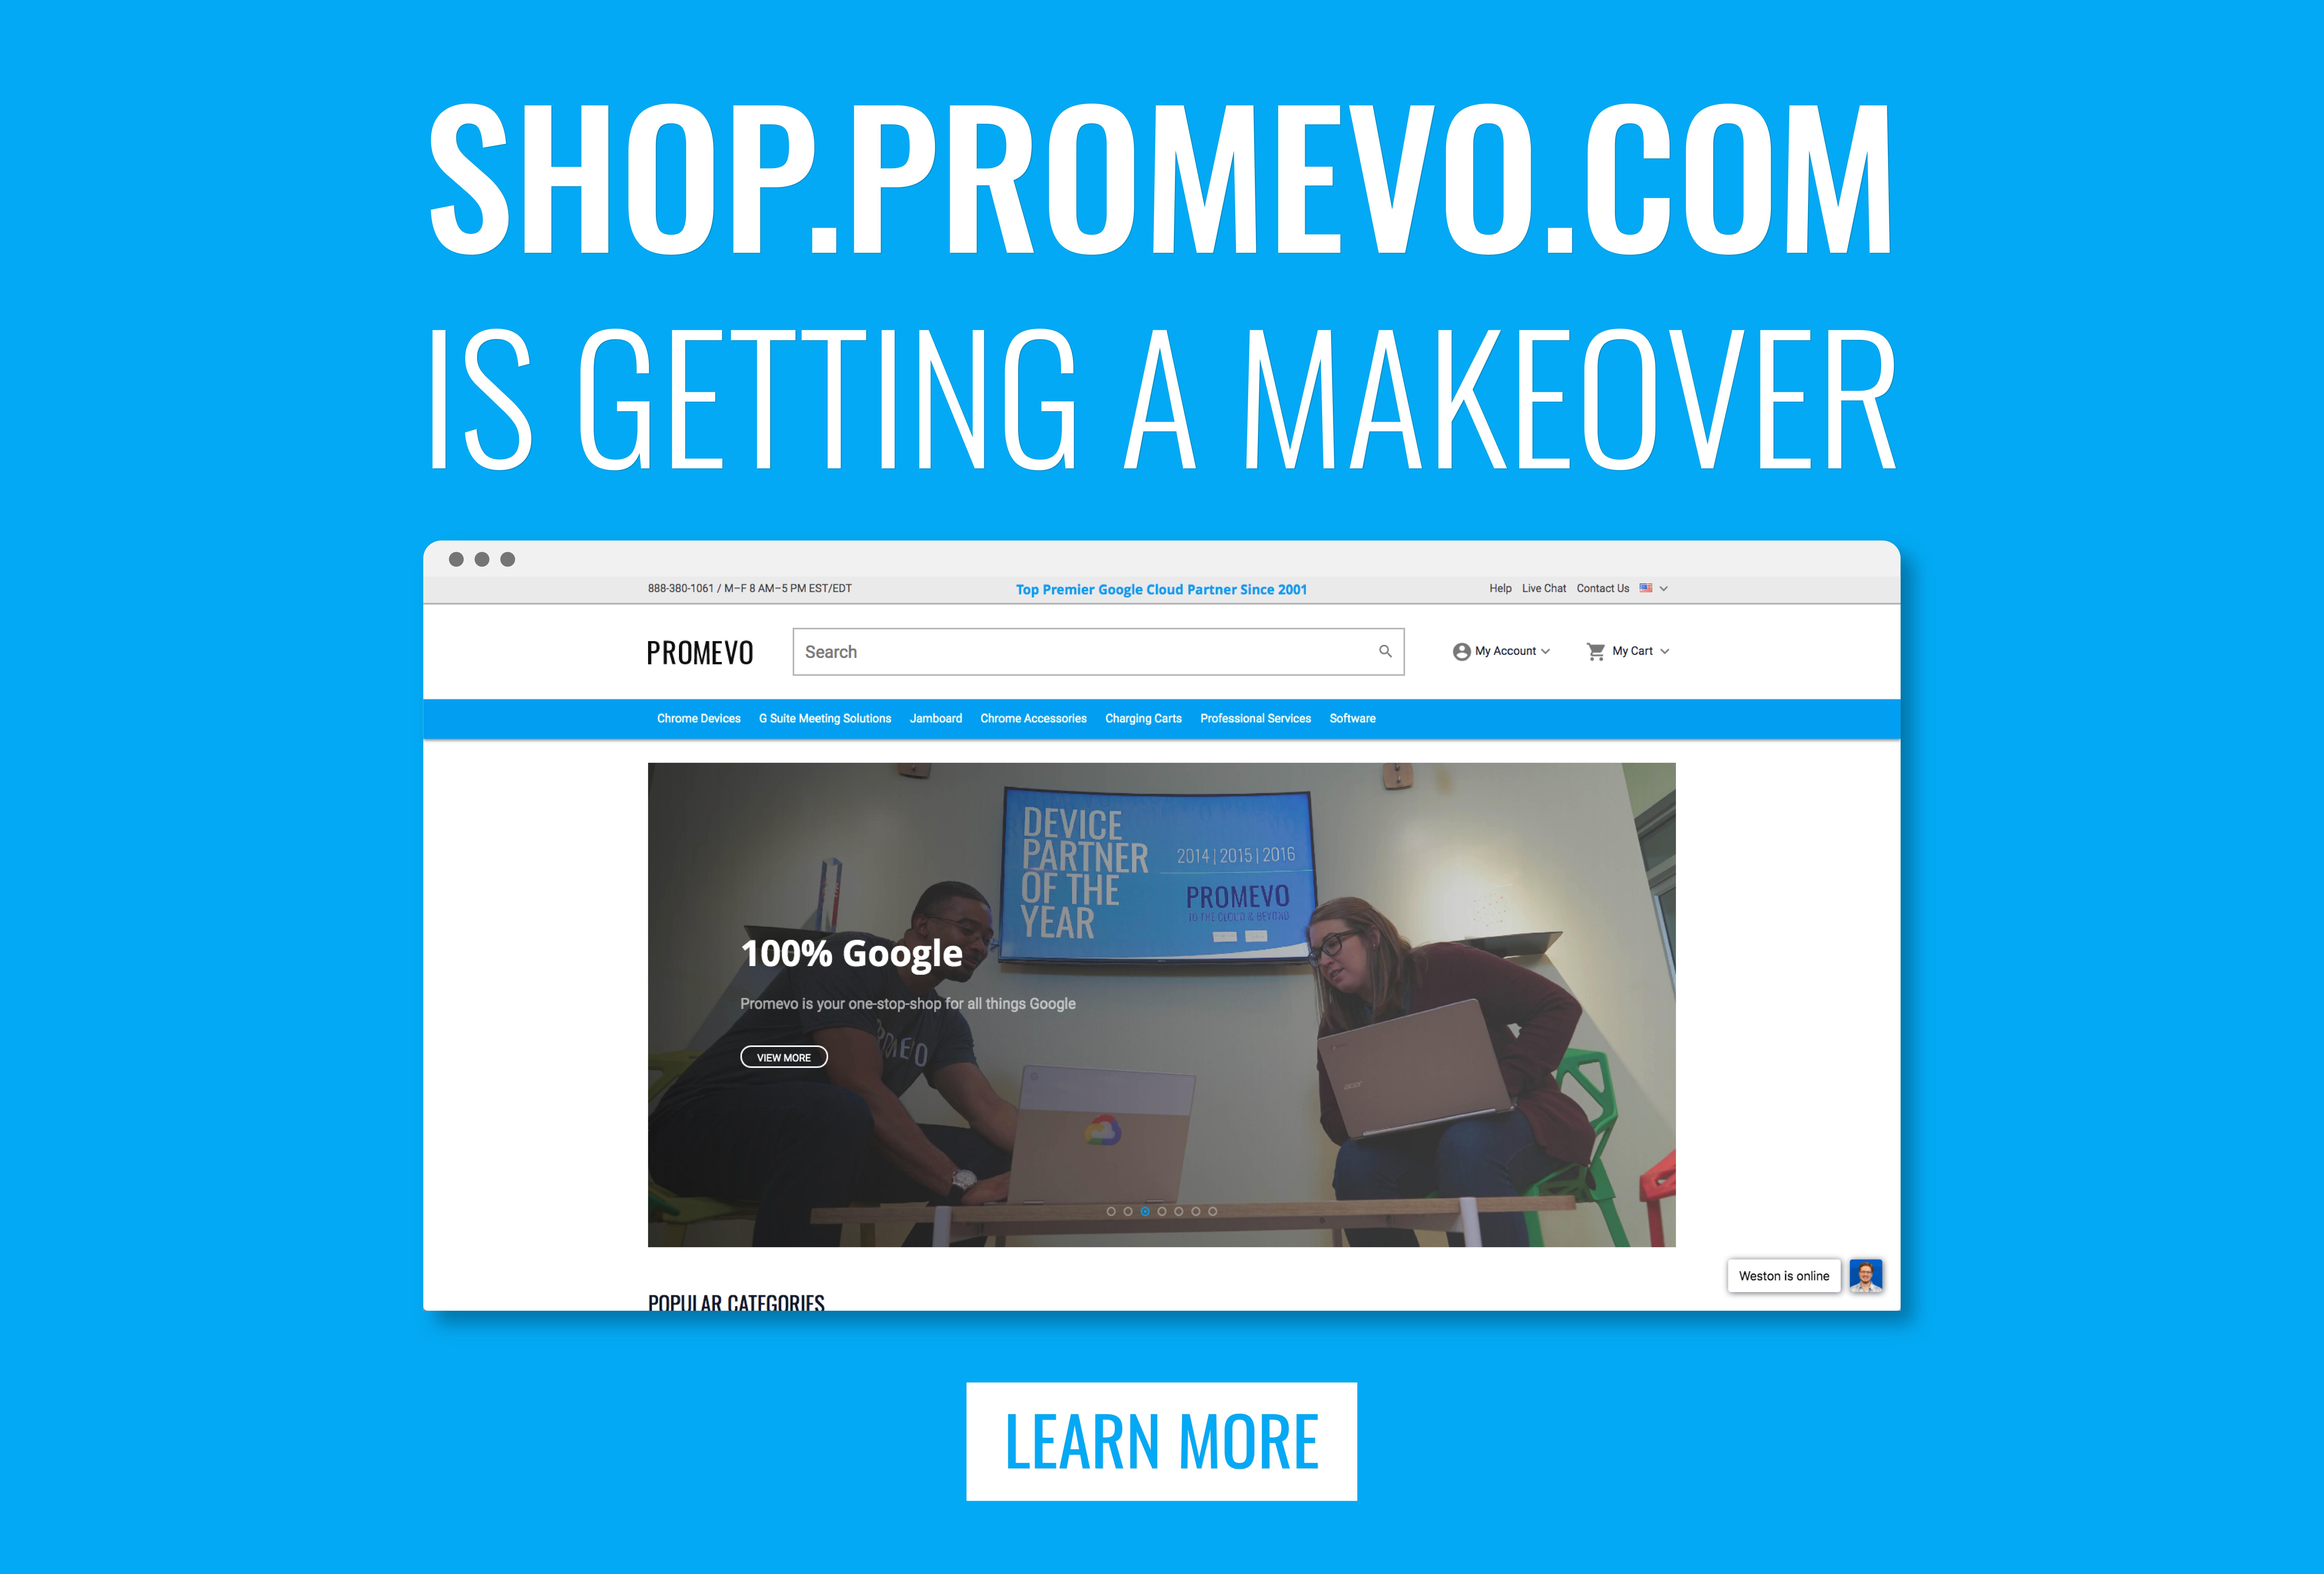 New Promevo Shop Website Coming